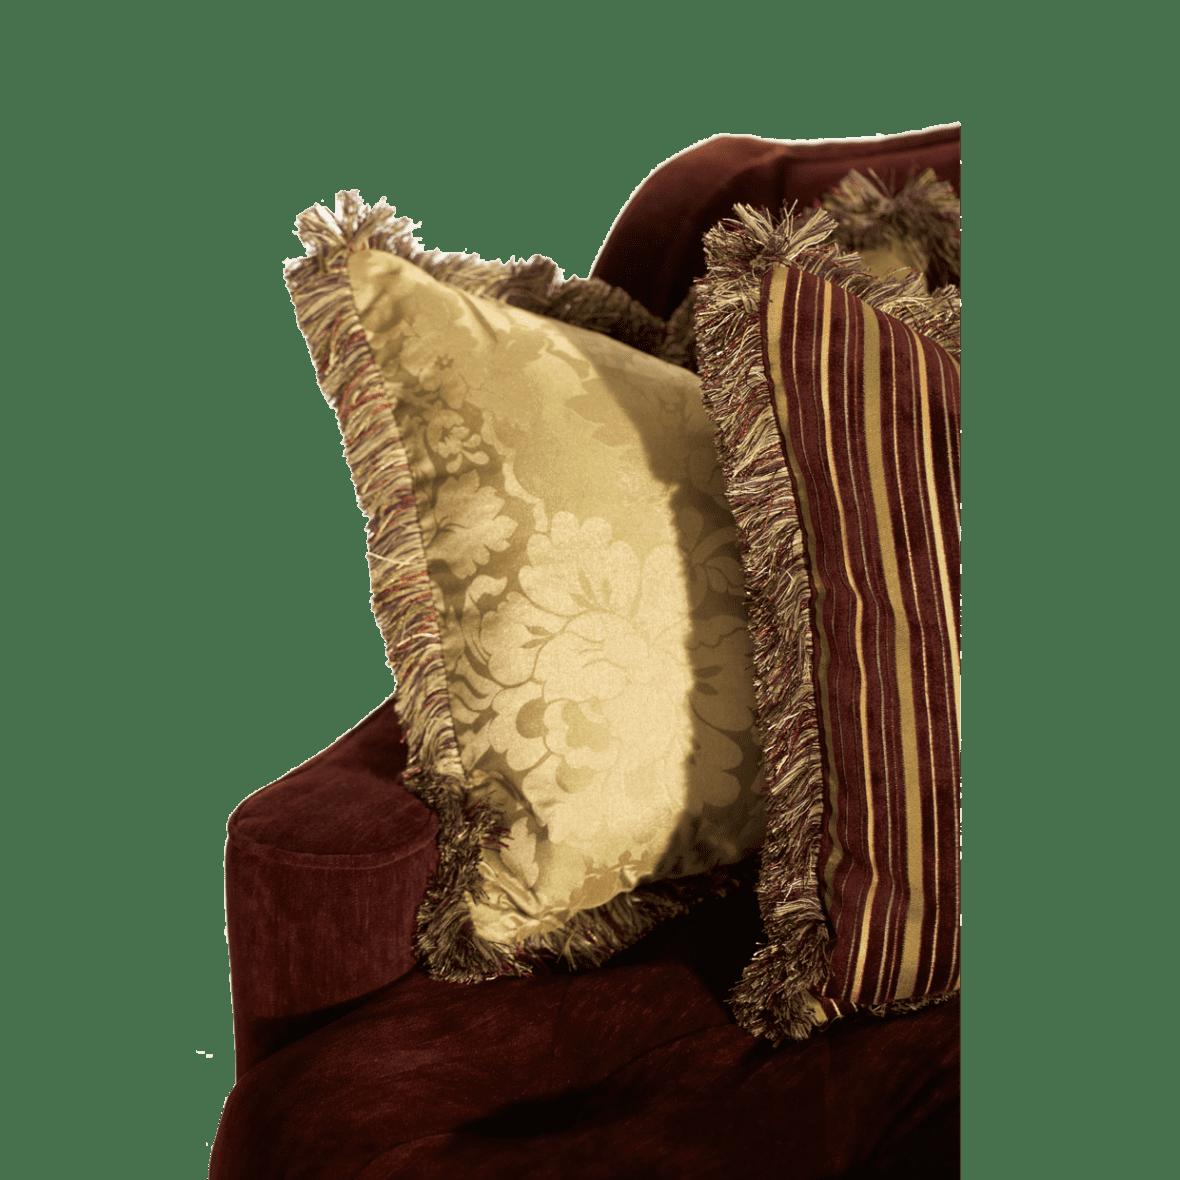 Софа Loveseat, стёганая, обивка Eggplant